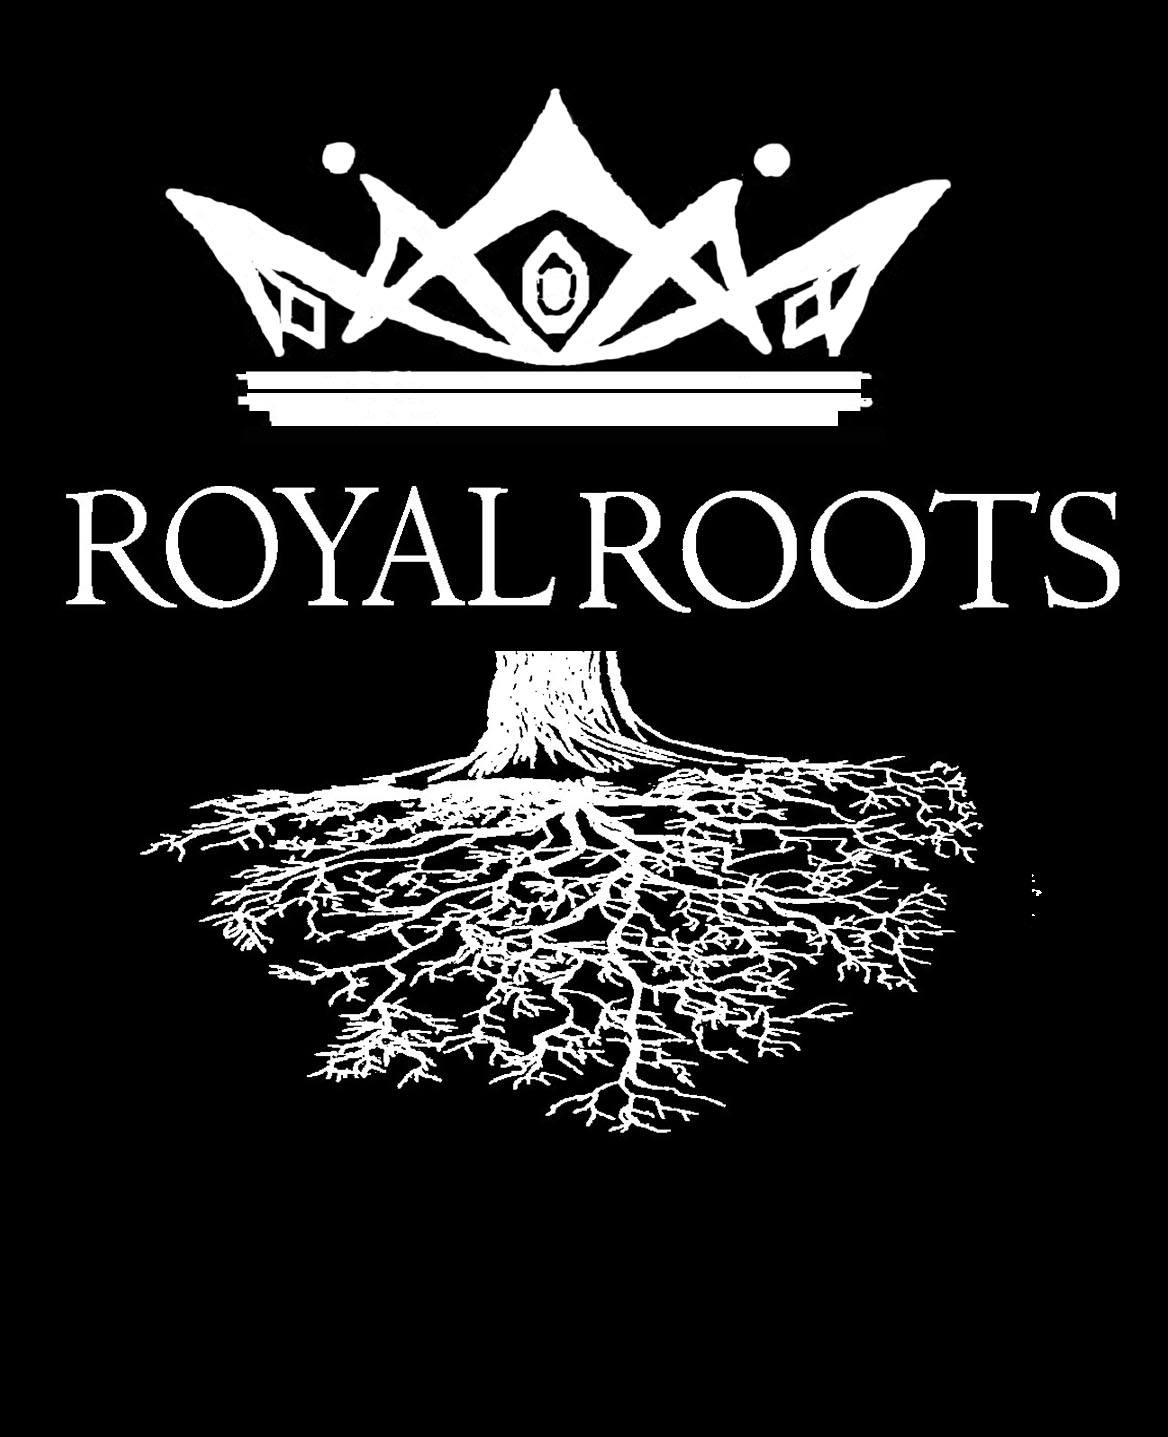 Royal Roots Barber Shop